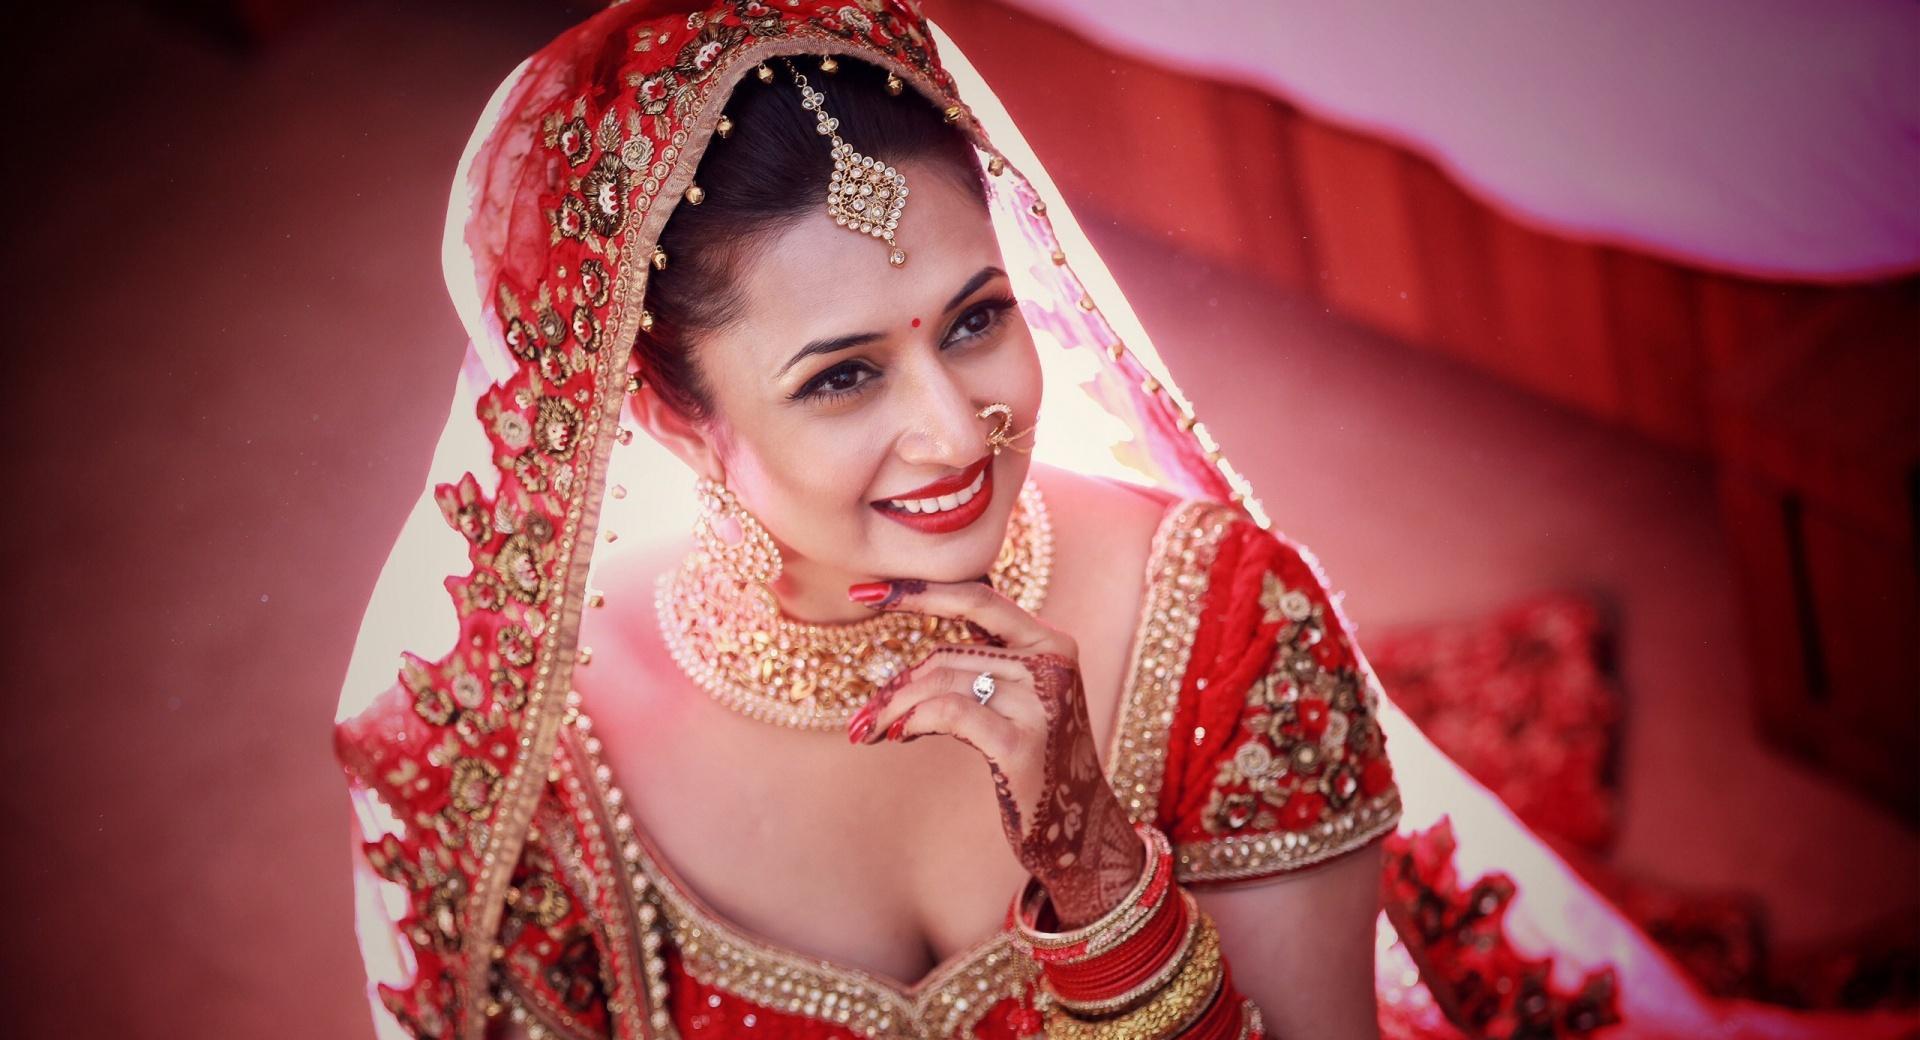 Divyanka Tripathi Wedding Bride wallpapers HD quality